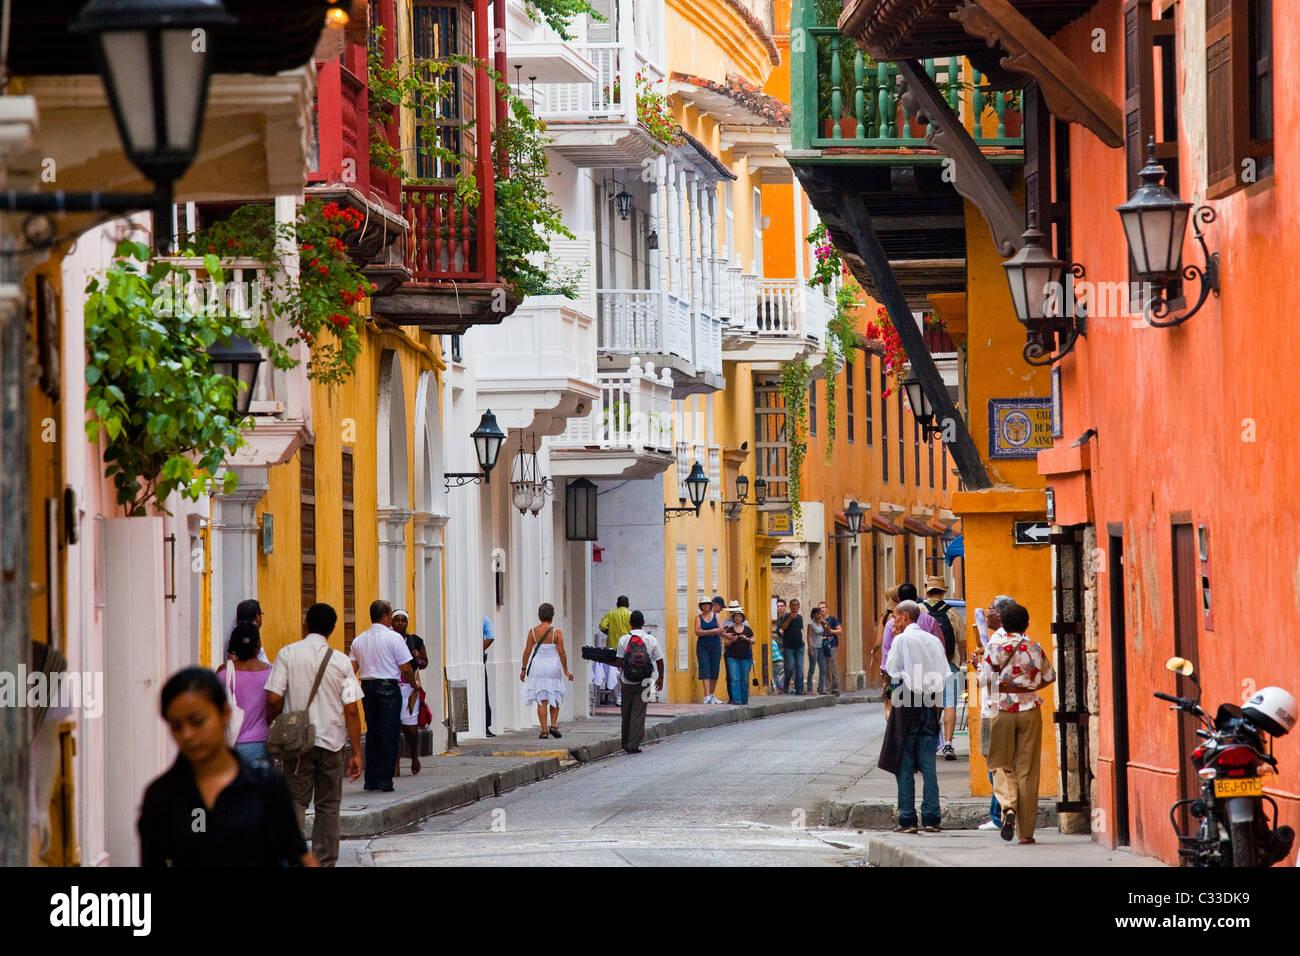 Balconies, Cartagena, Colombia - Stock Image